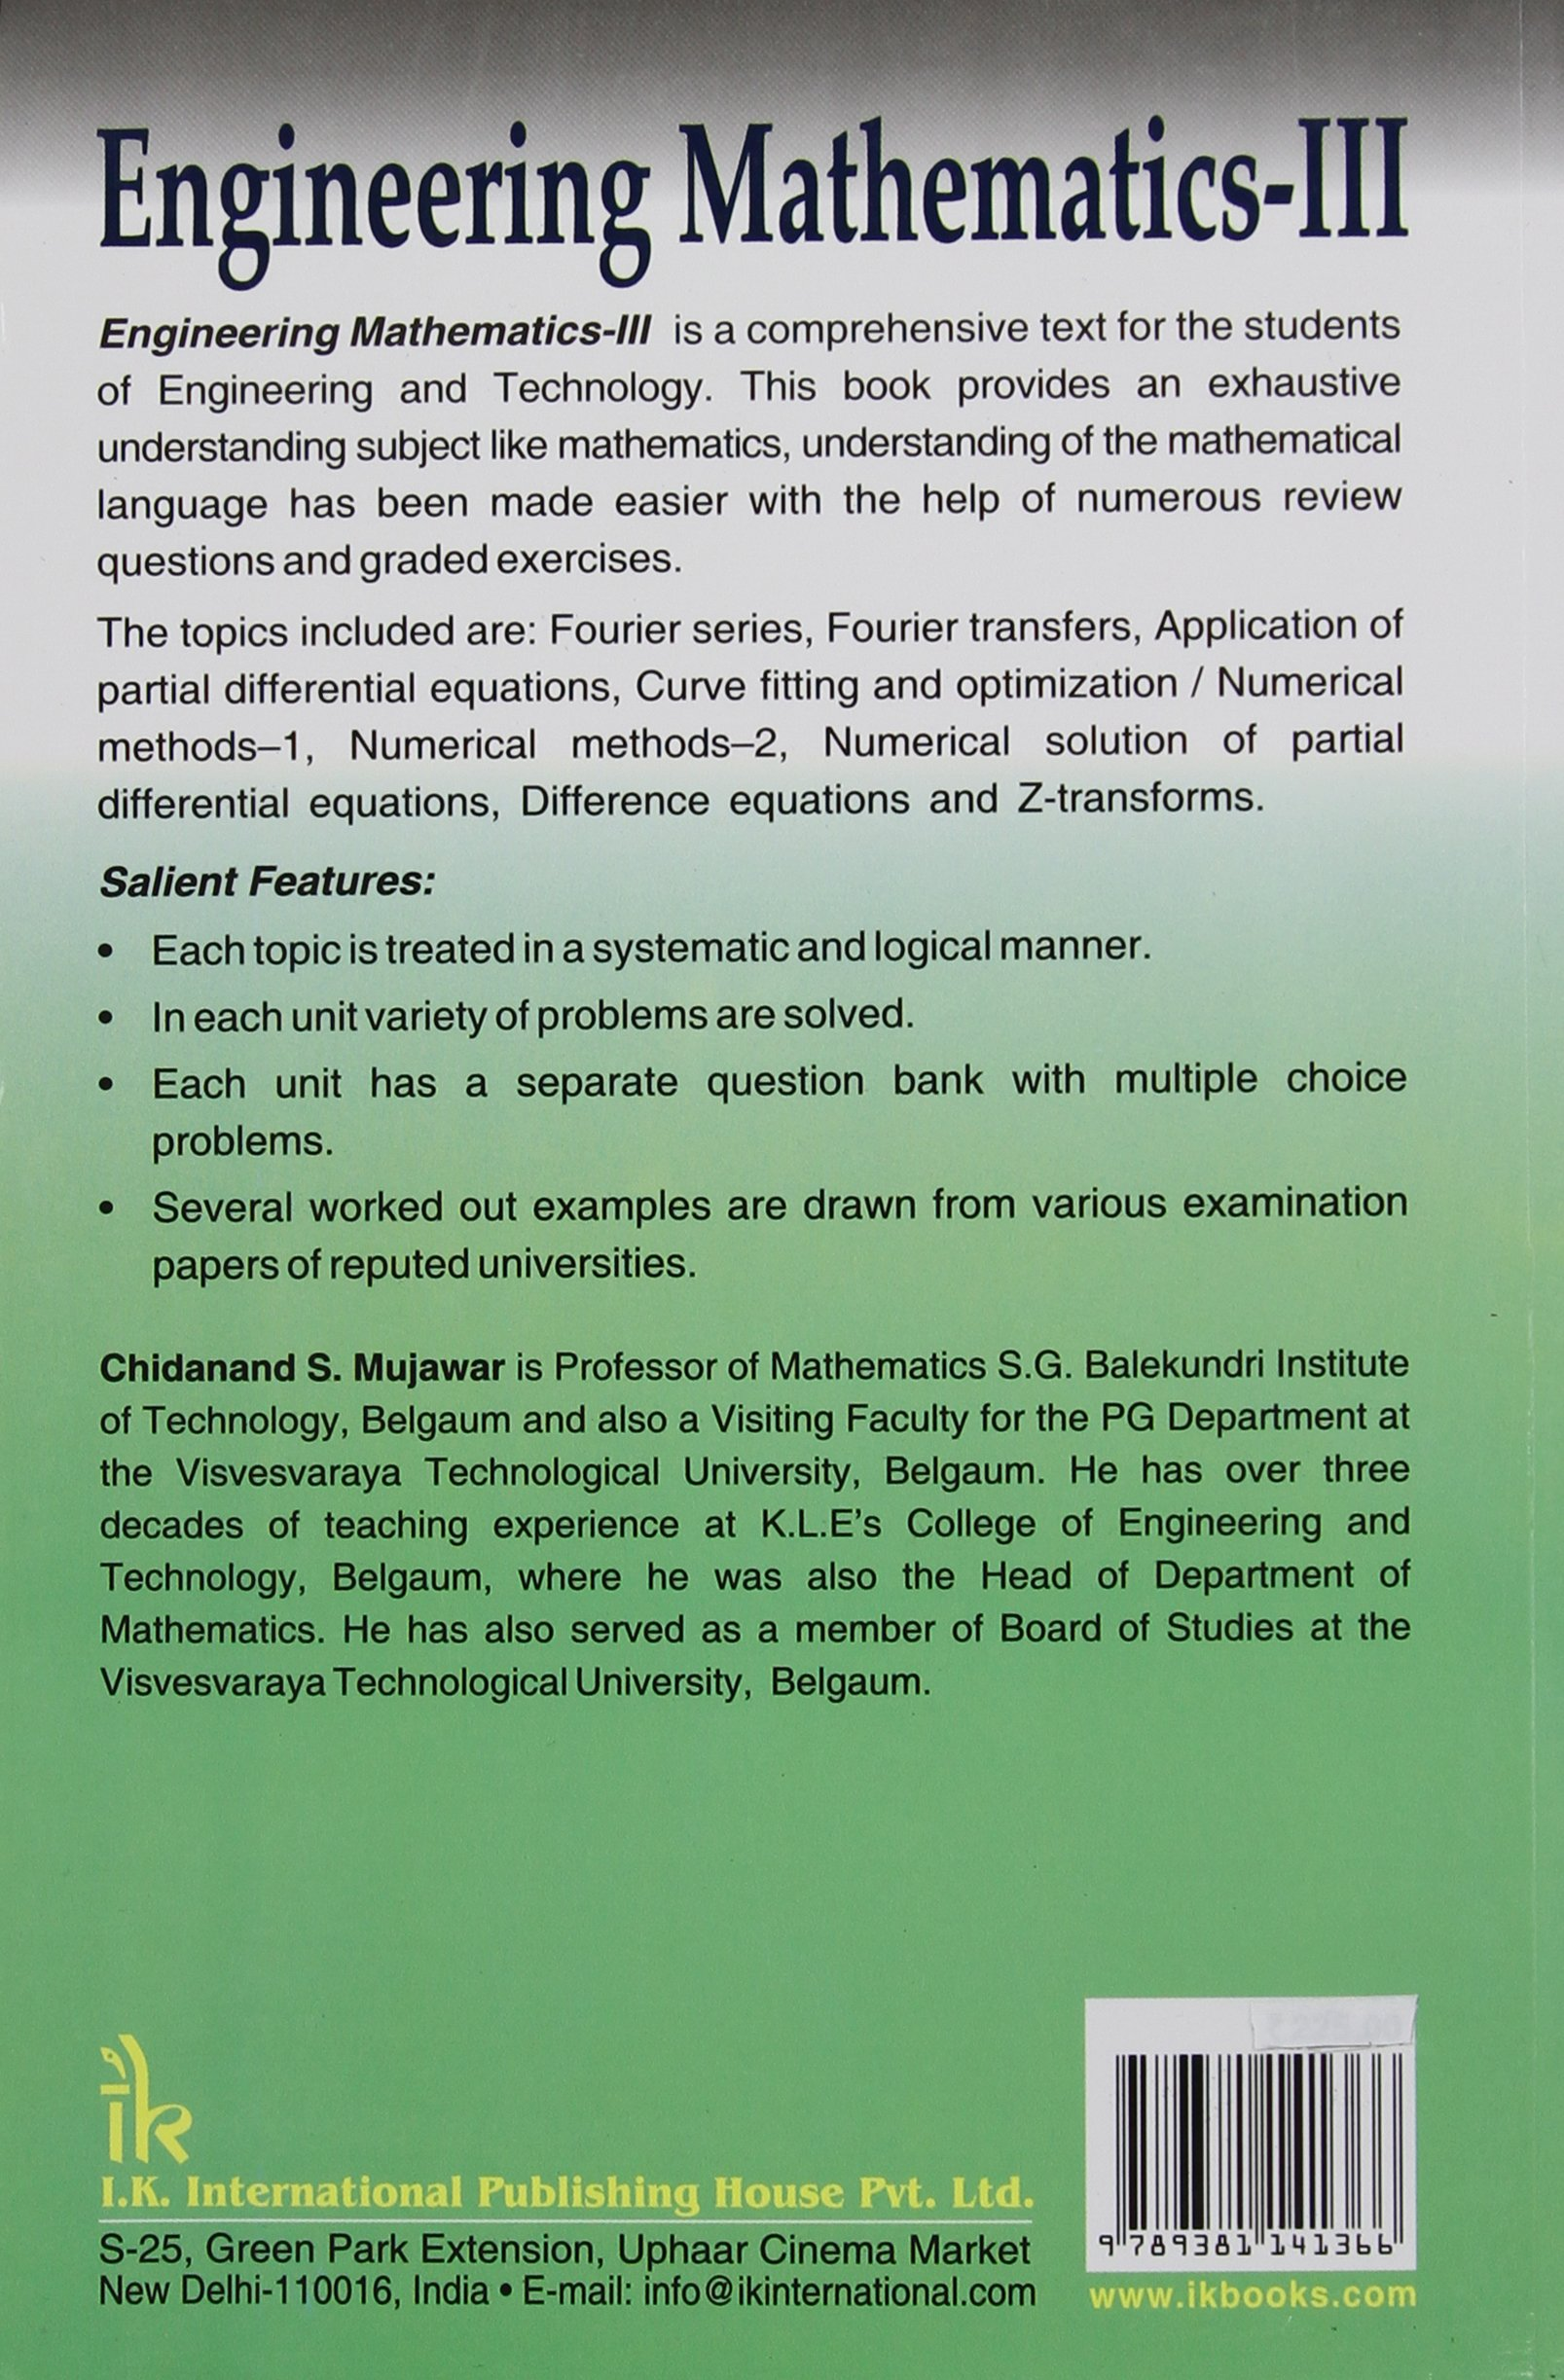 Engineering Mathematics - III: Chidanand S. Mujawar, 30 ...